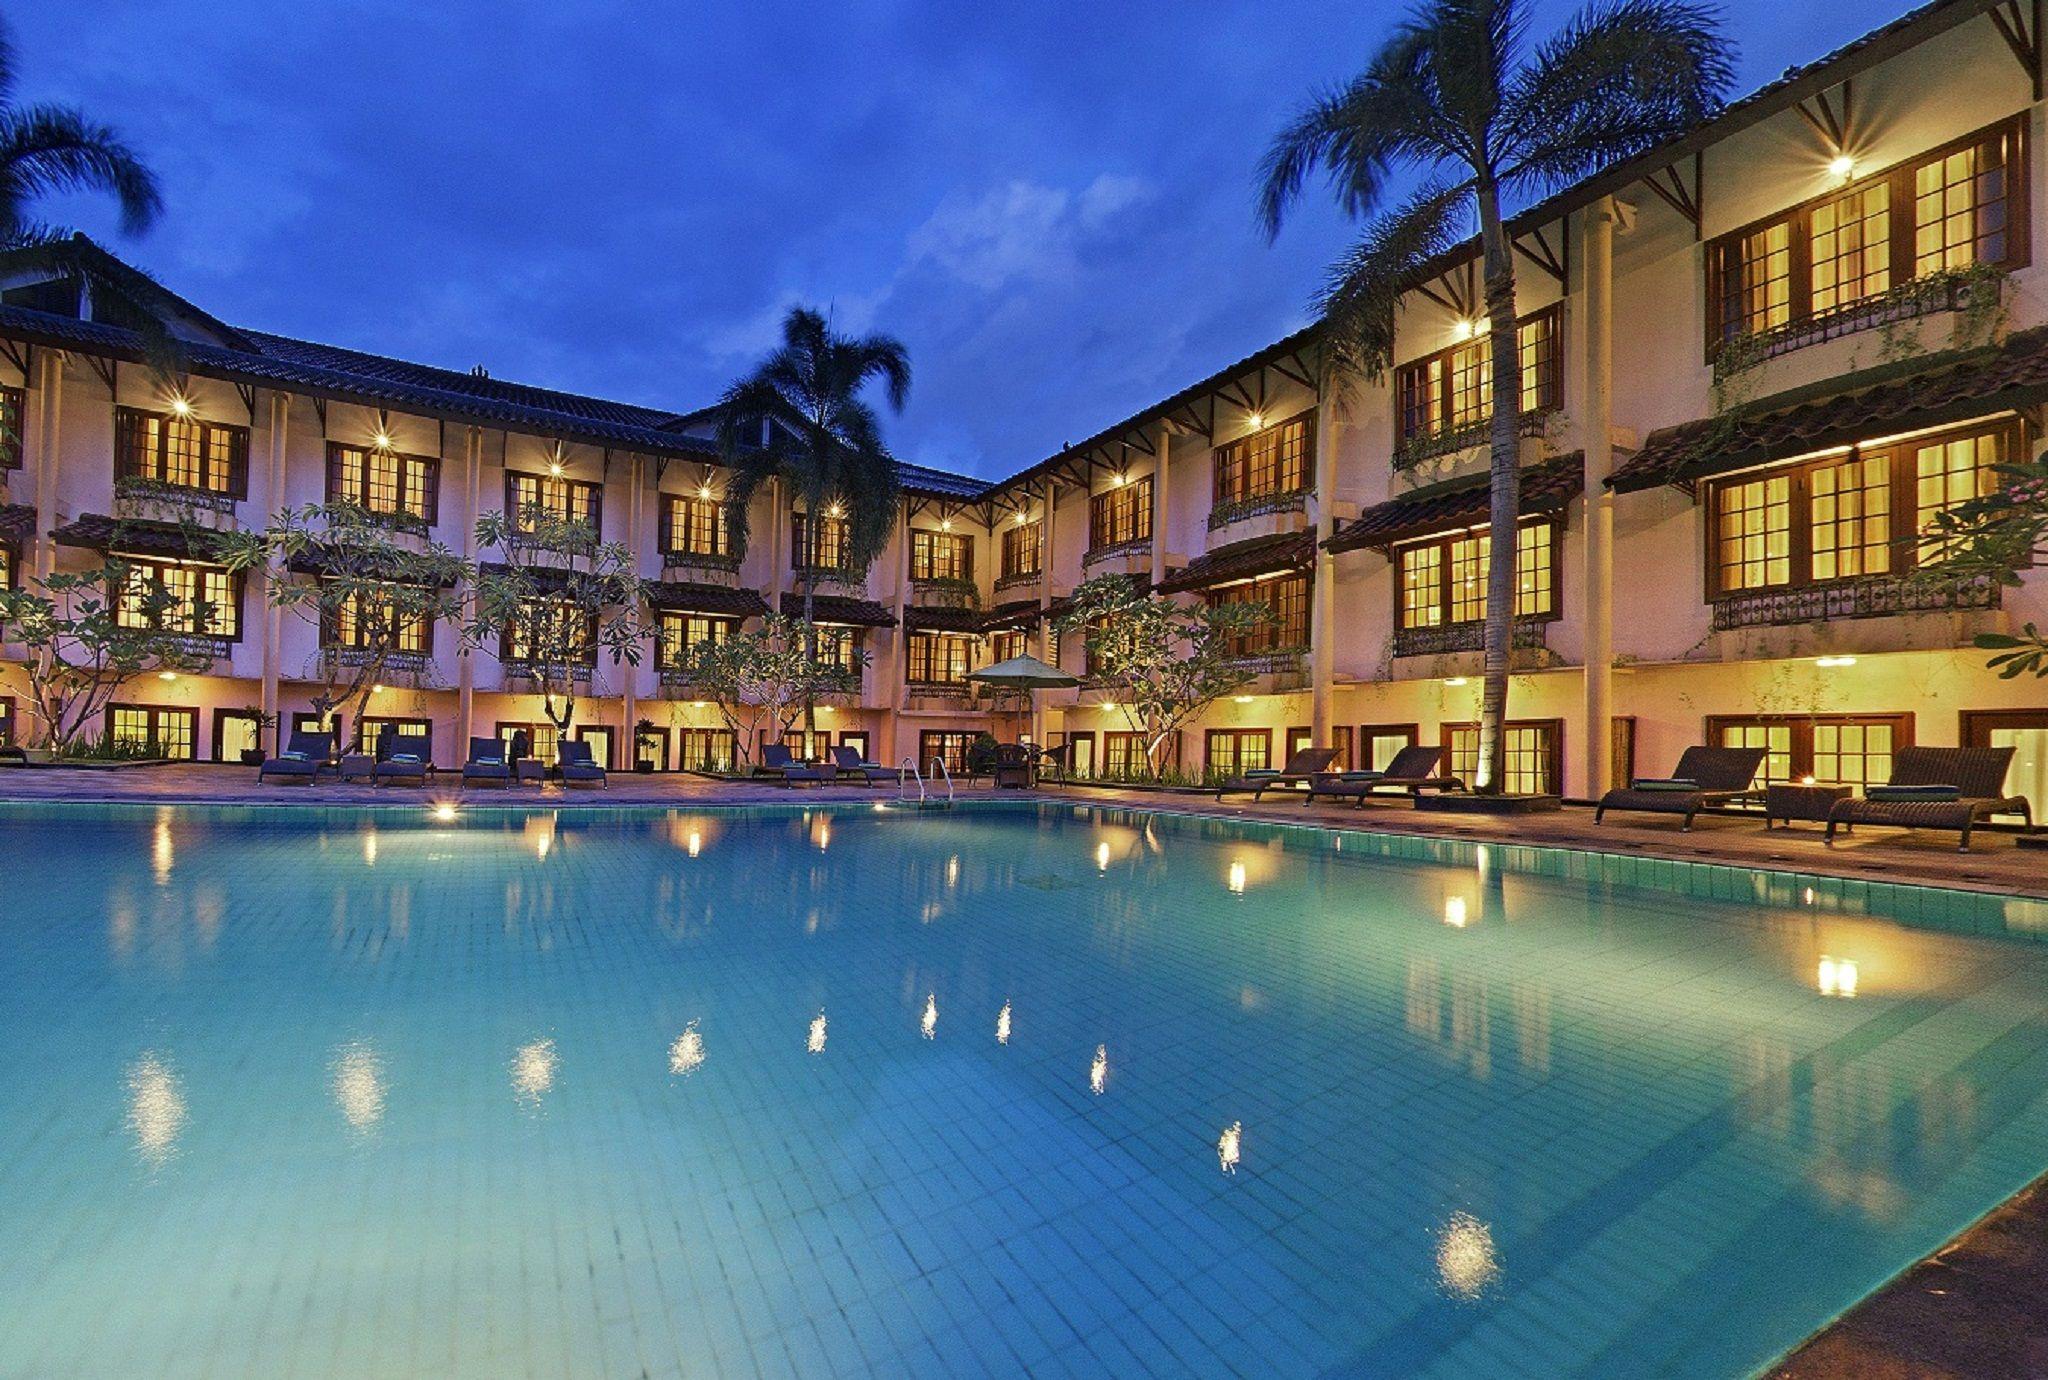 Prime Plaza Hotel Jogjakarta, Sleman